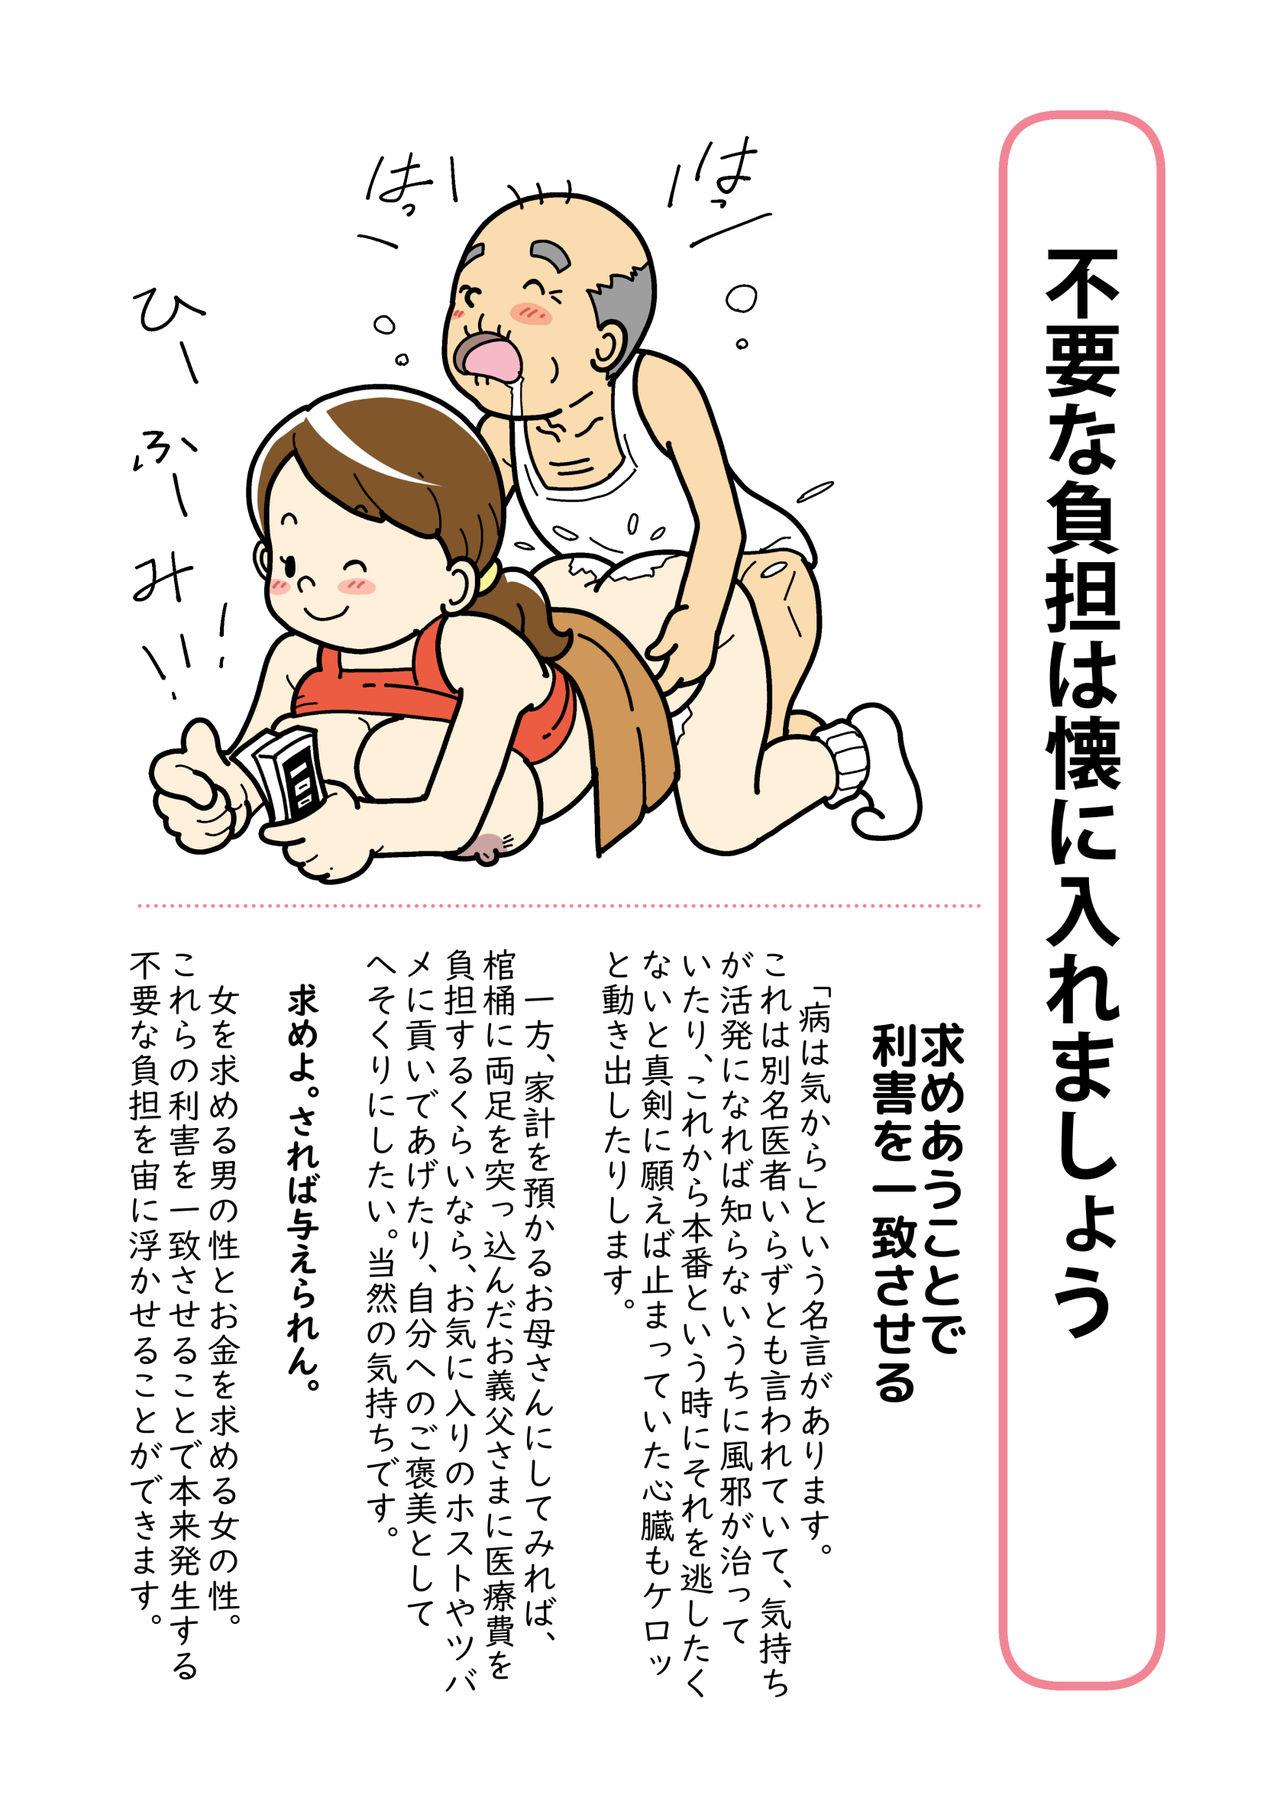 Isogasii Okaasan No Tamuno Sasa Rouzin Seikaigo | Guide for Elderly Sex Health Care to Busy Mom 11